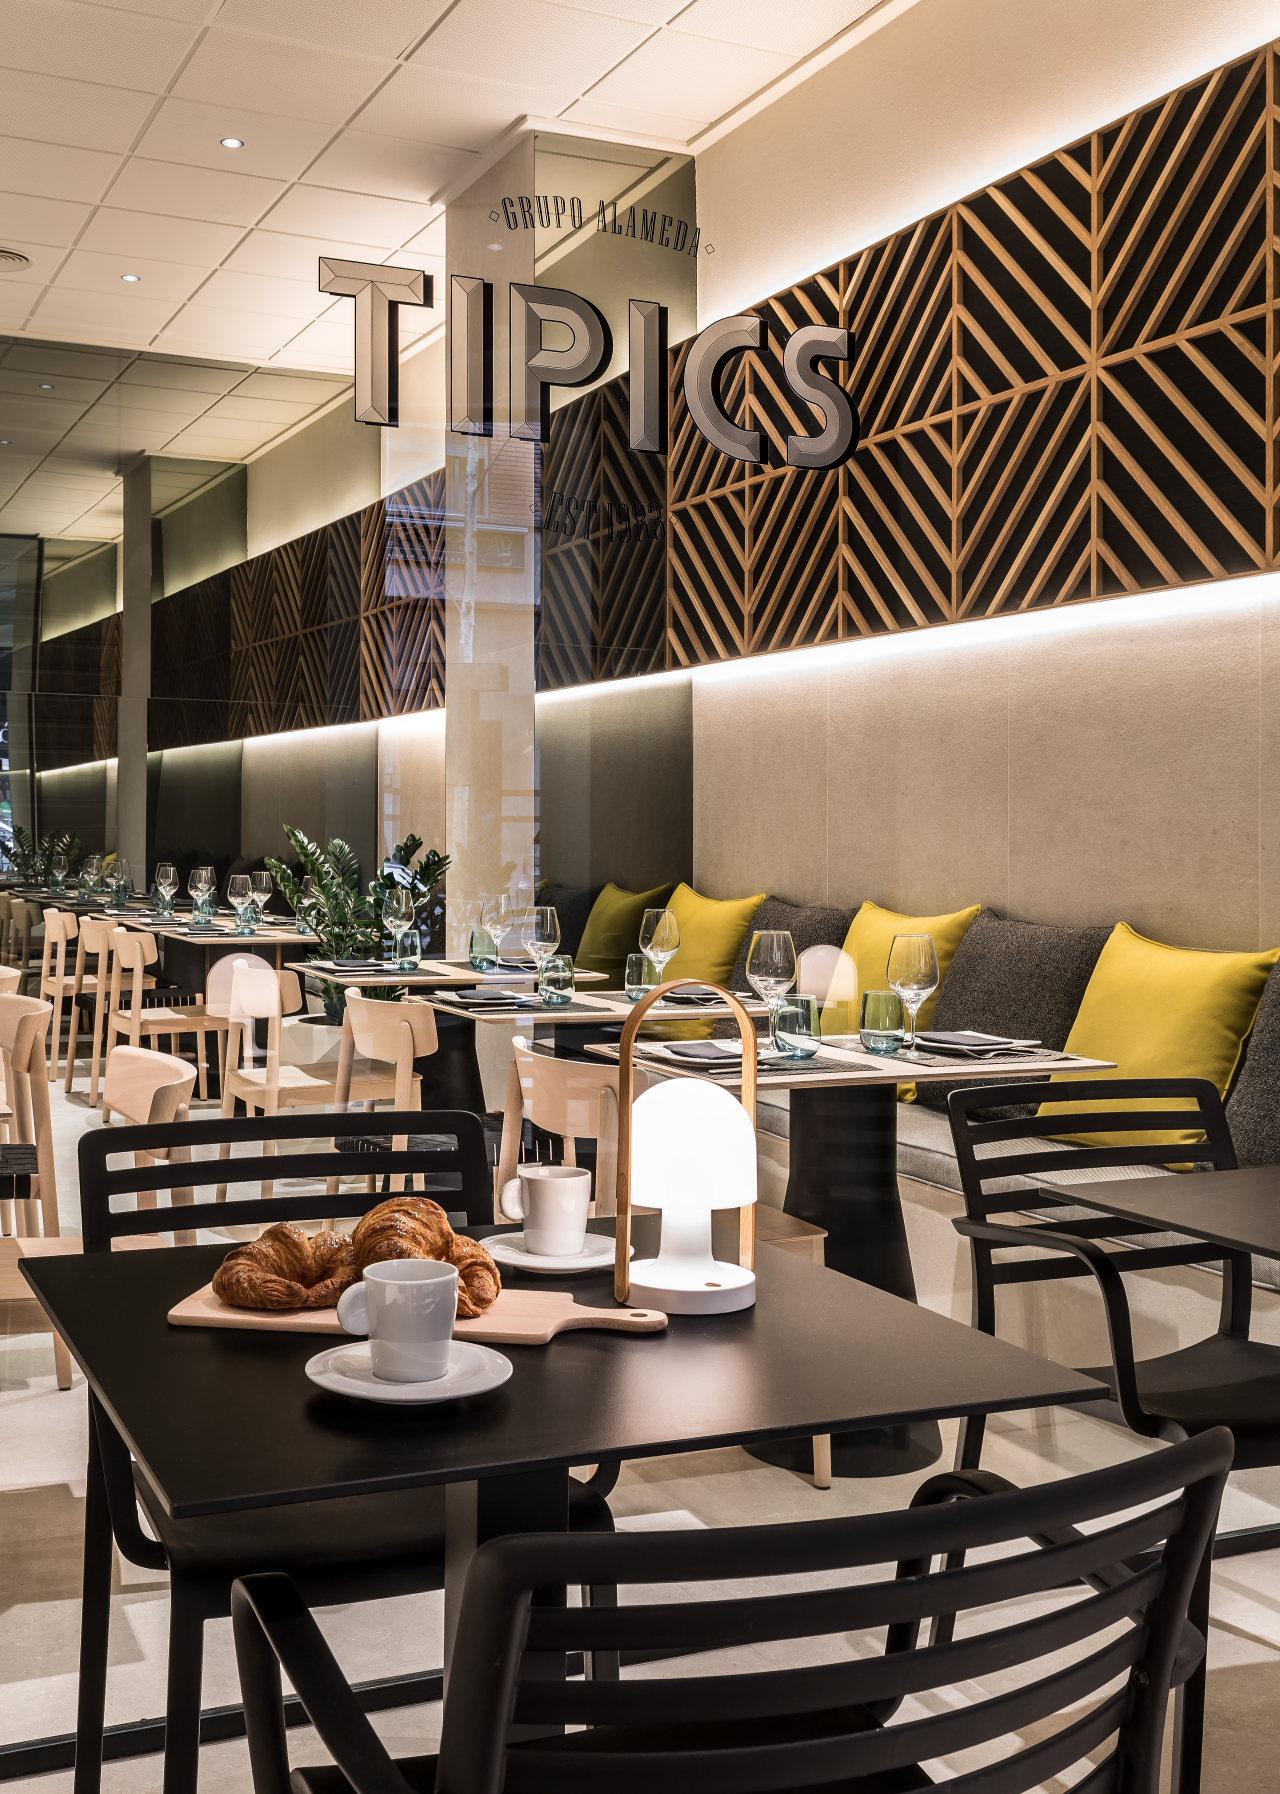 fotografia-arquitectura–interiorismo-valencia-german-cabo-estudihac-restaurante-tipics-xativa (5)